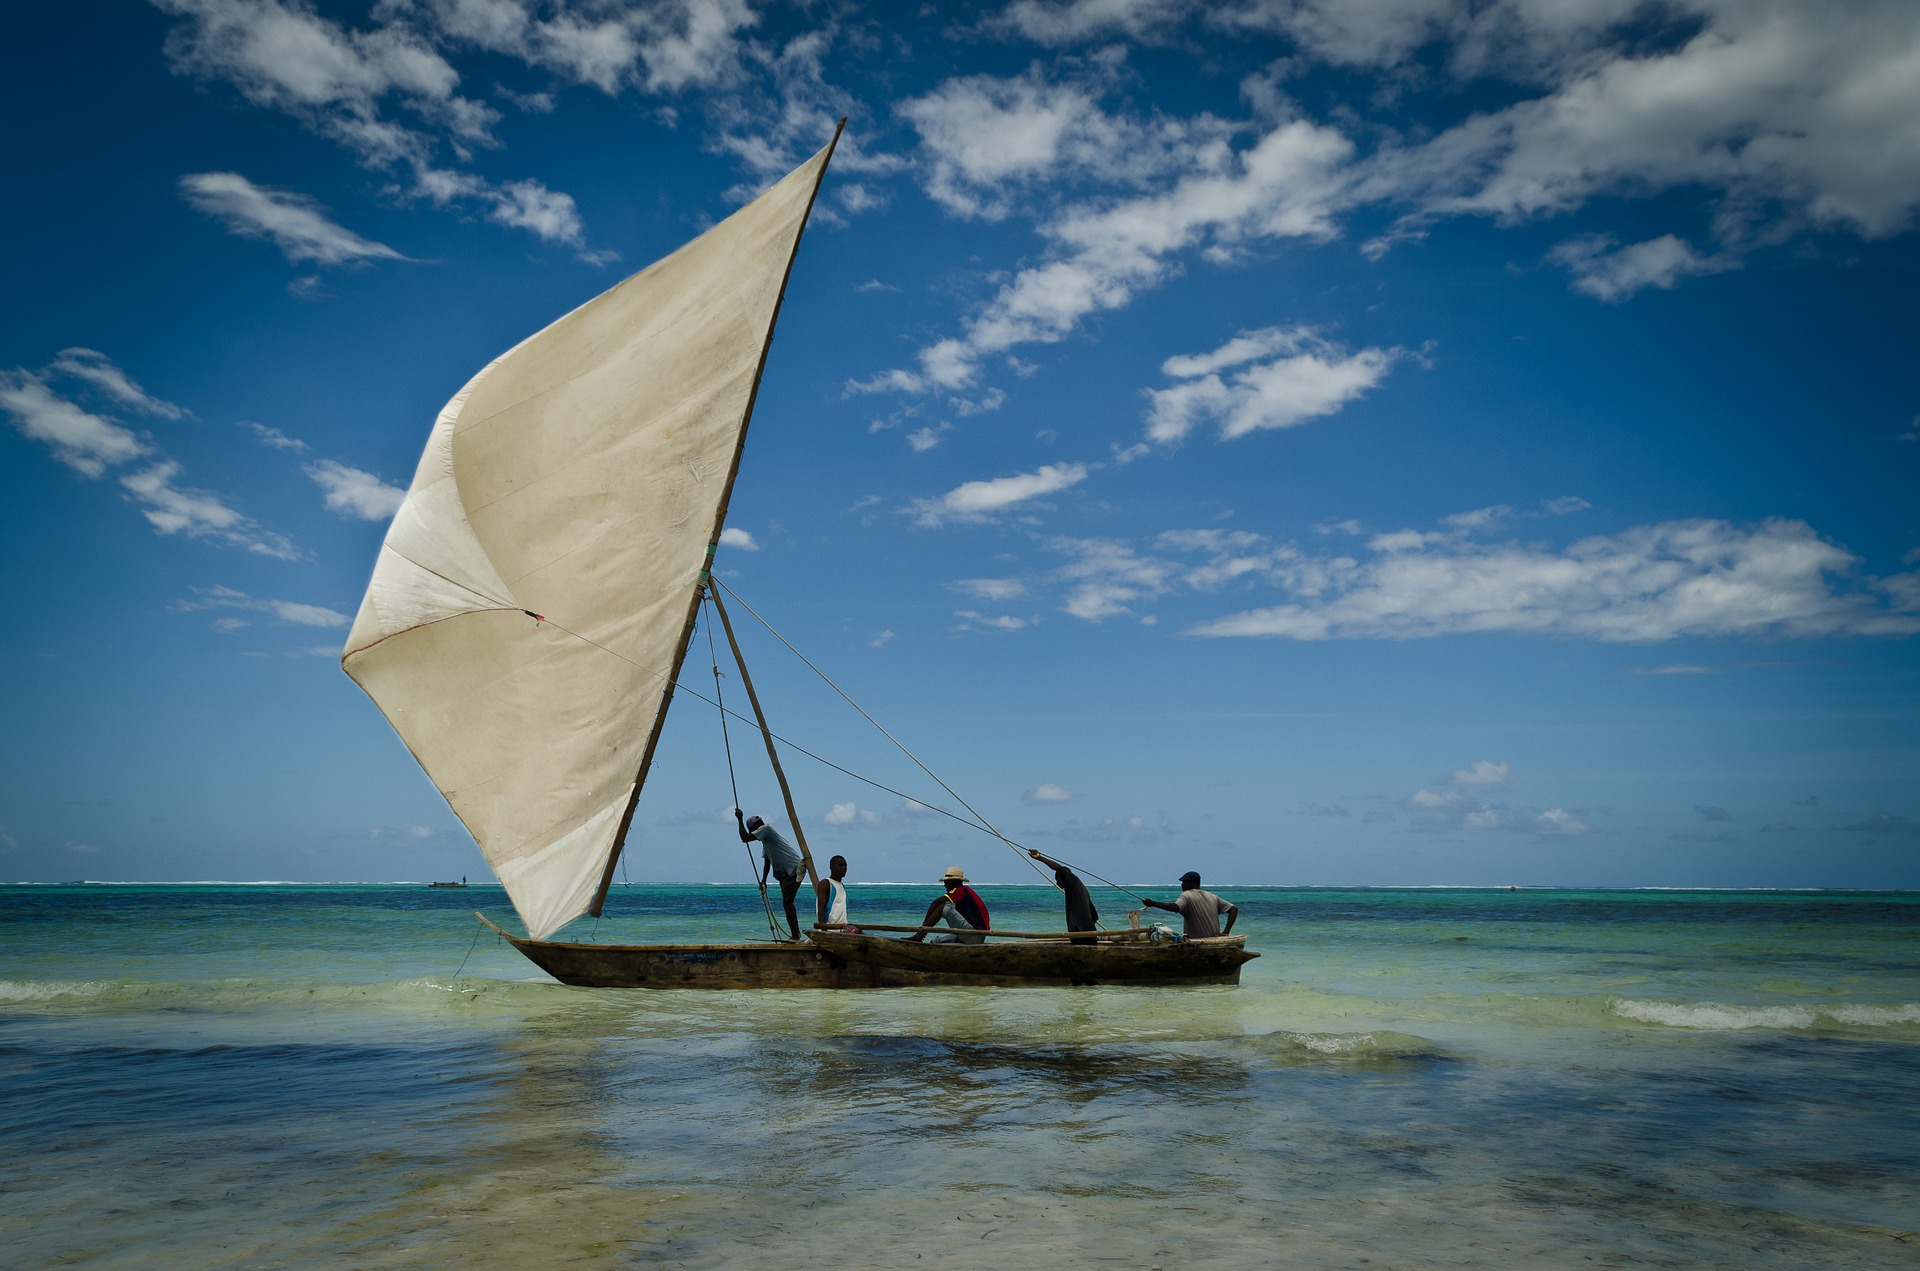 Zanzibar, Boot, Kerze, Meer, Himmel, Entspannen Sie sich, Navigation, Blau - Wallpaper HD - Prof.-falken.com